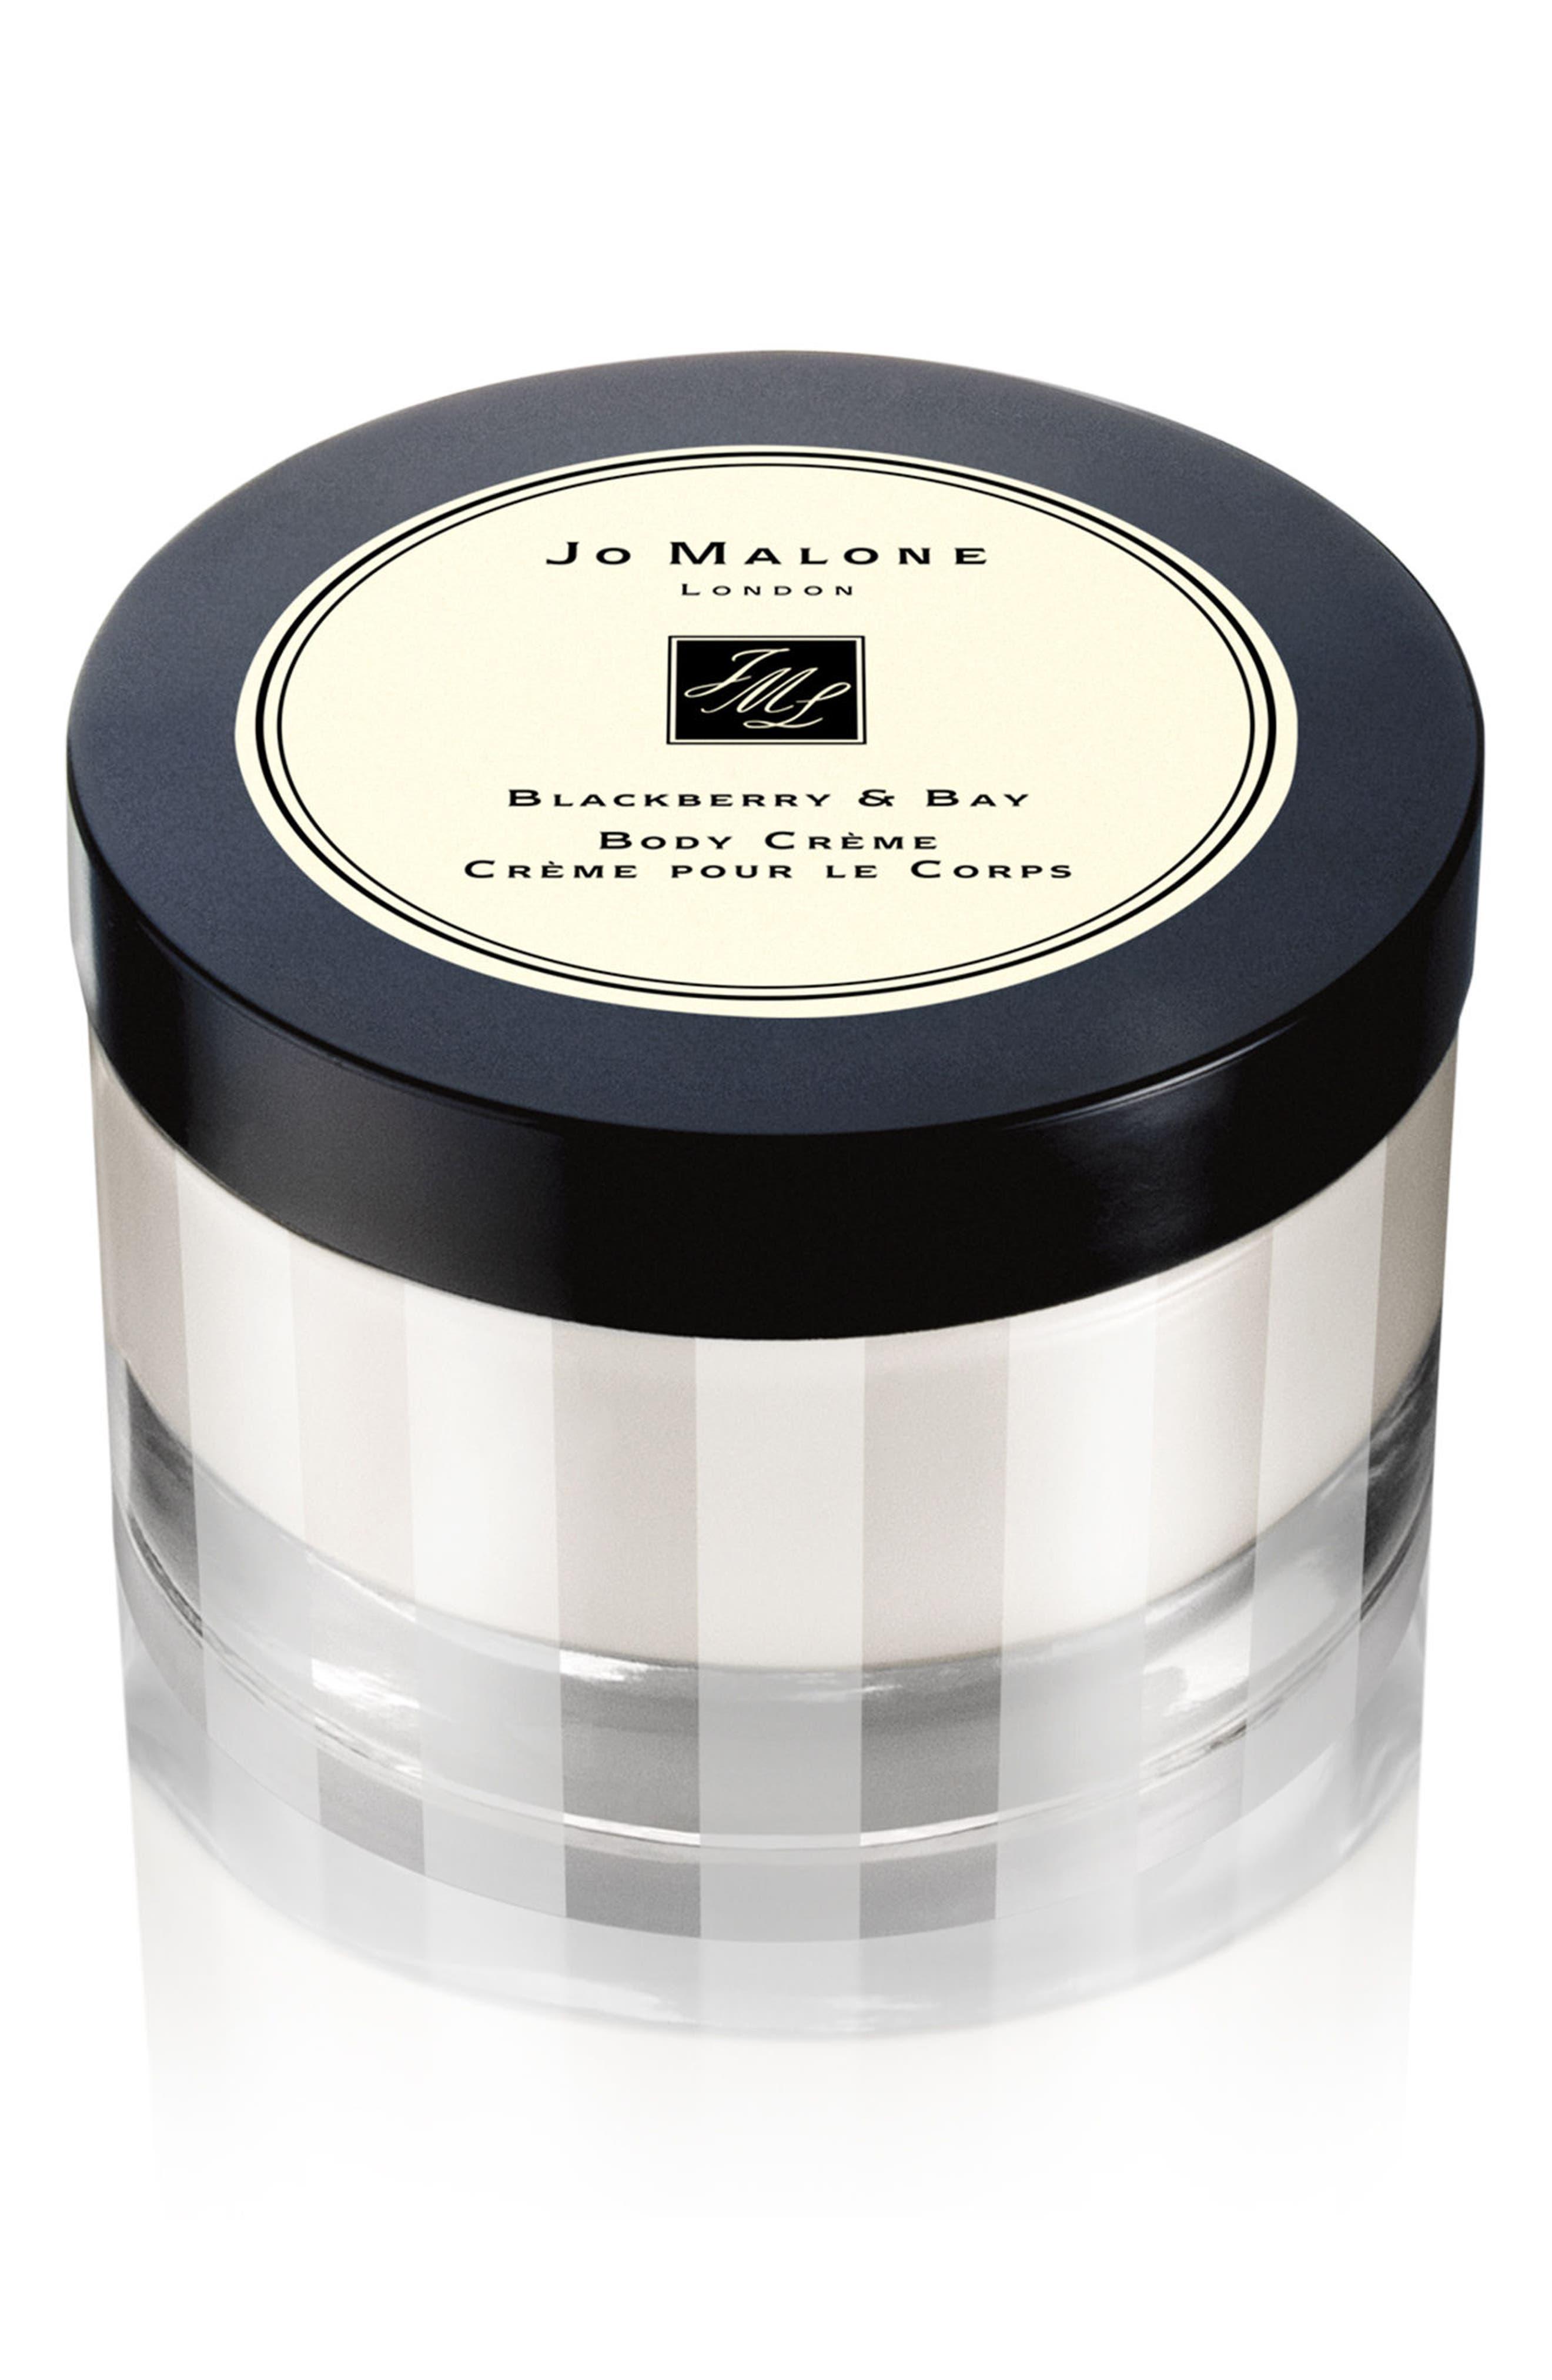 Alternate Image 1 Selected - Jo Malone London™ 'Blackberry & Bay' Body Crème